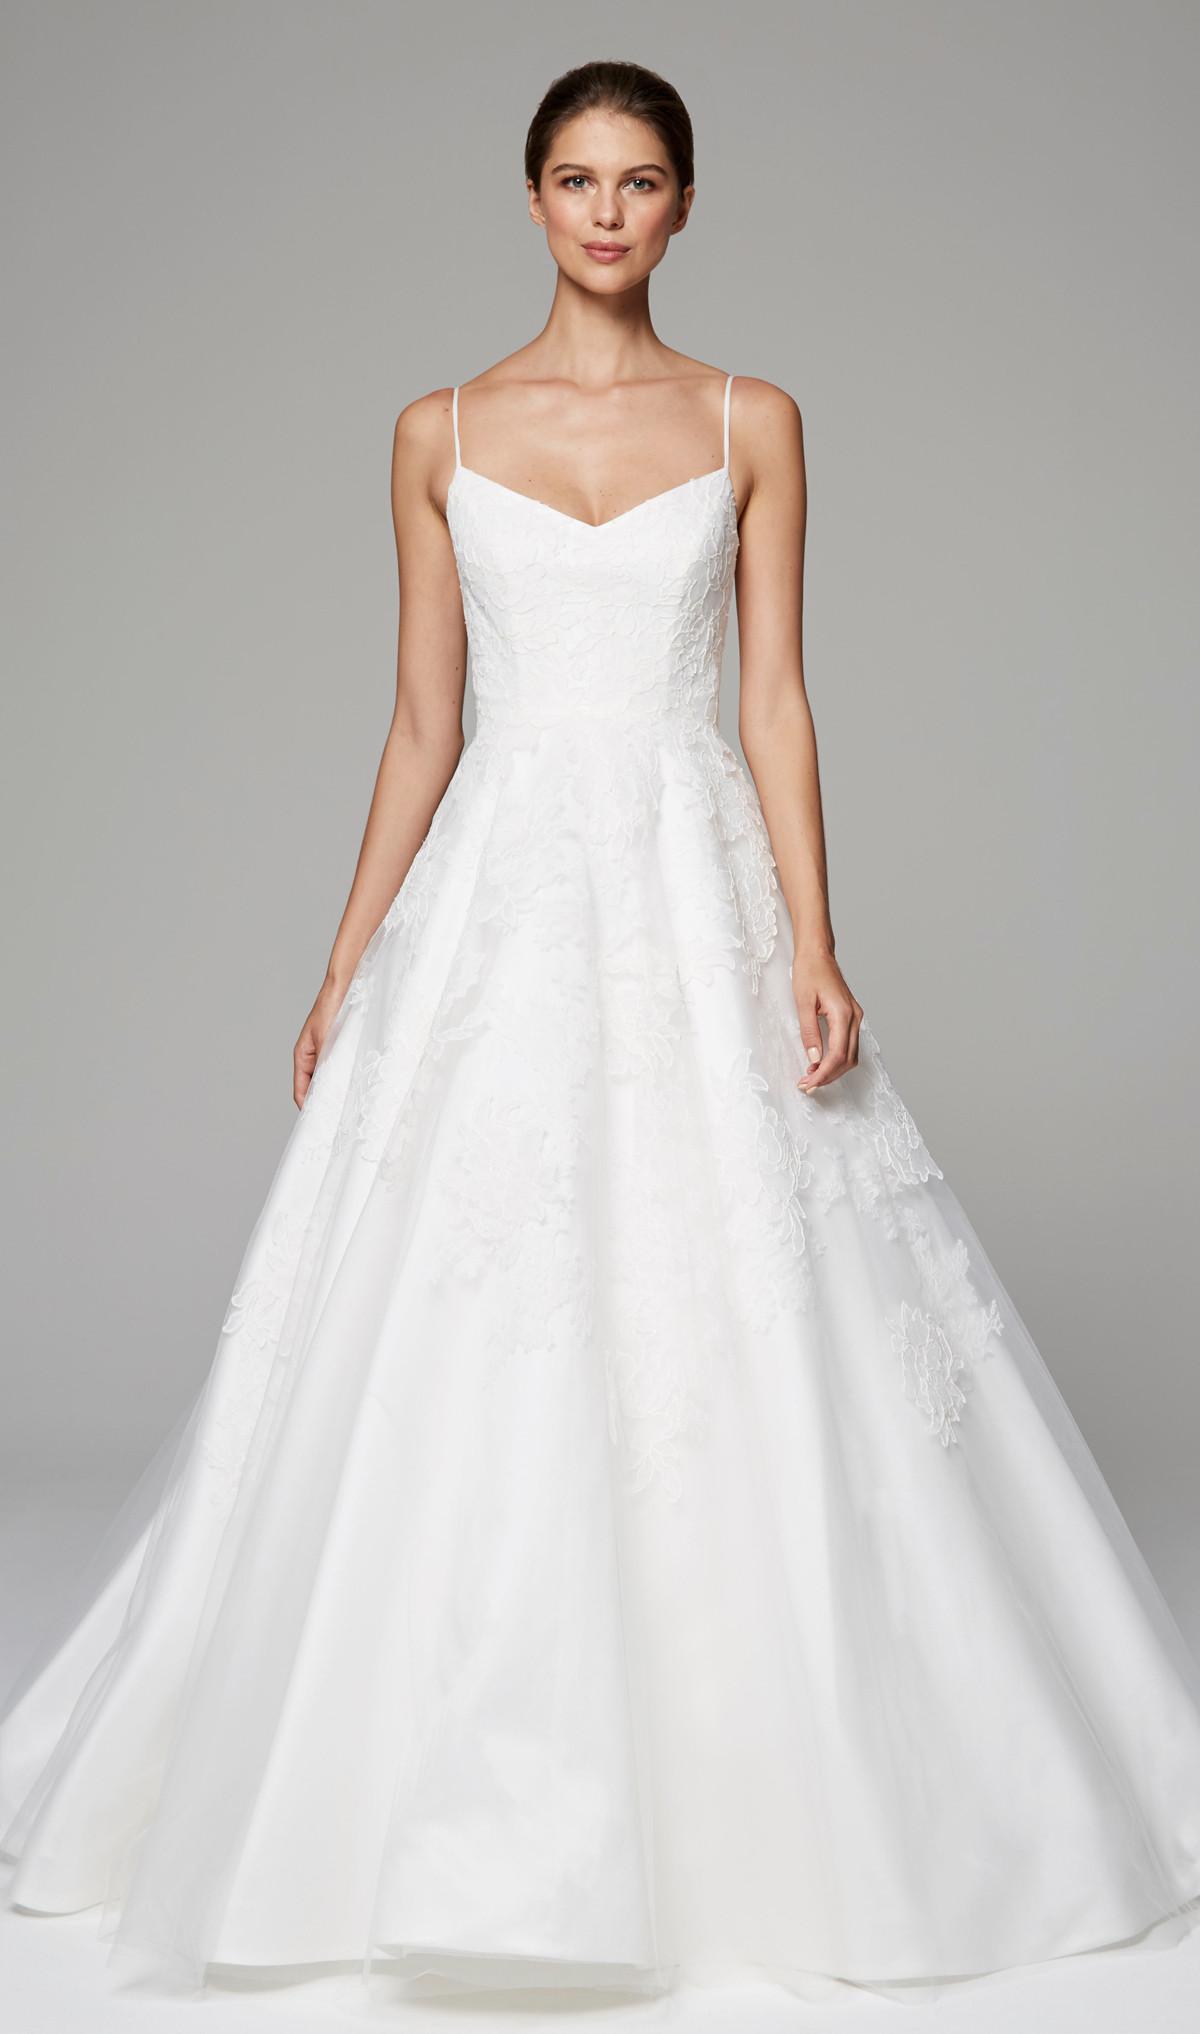 Spaghetti Strap A Line Wedding Dress  Spaghetti Strap A line V neck Wedding Dress